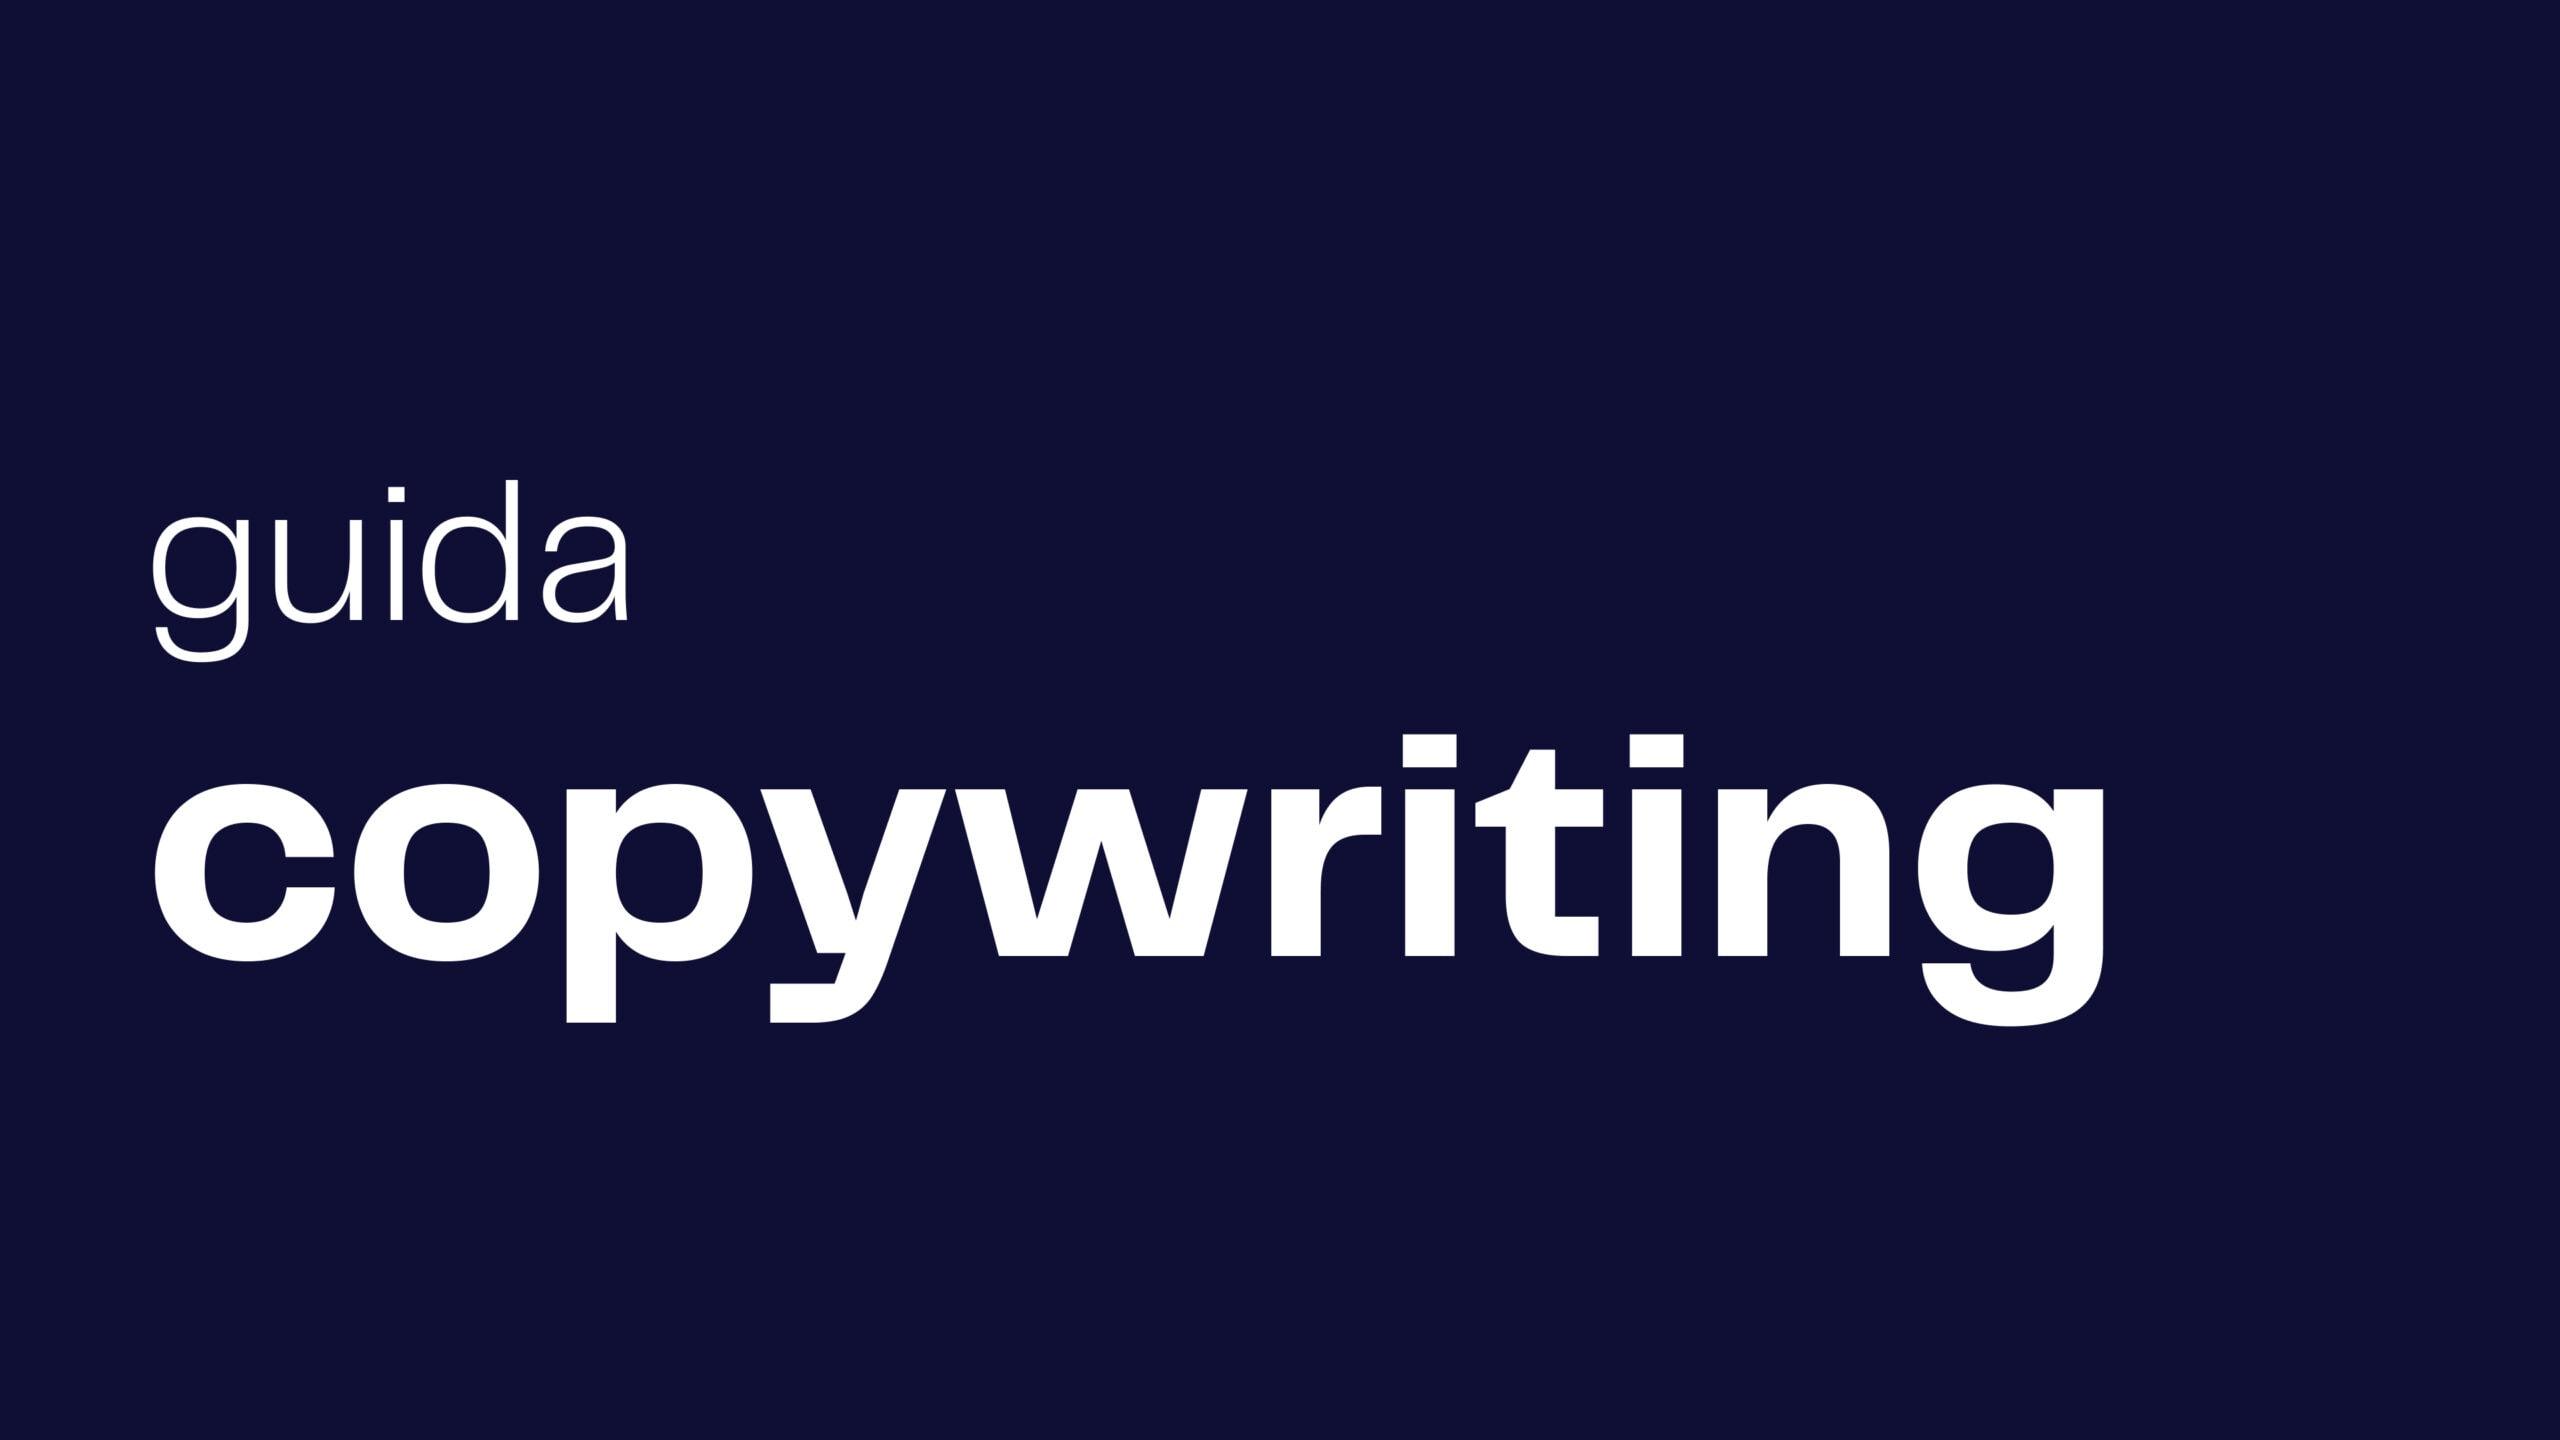 guida copywriting